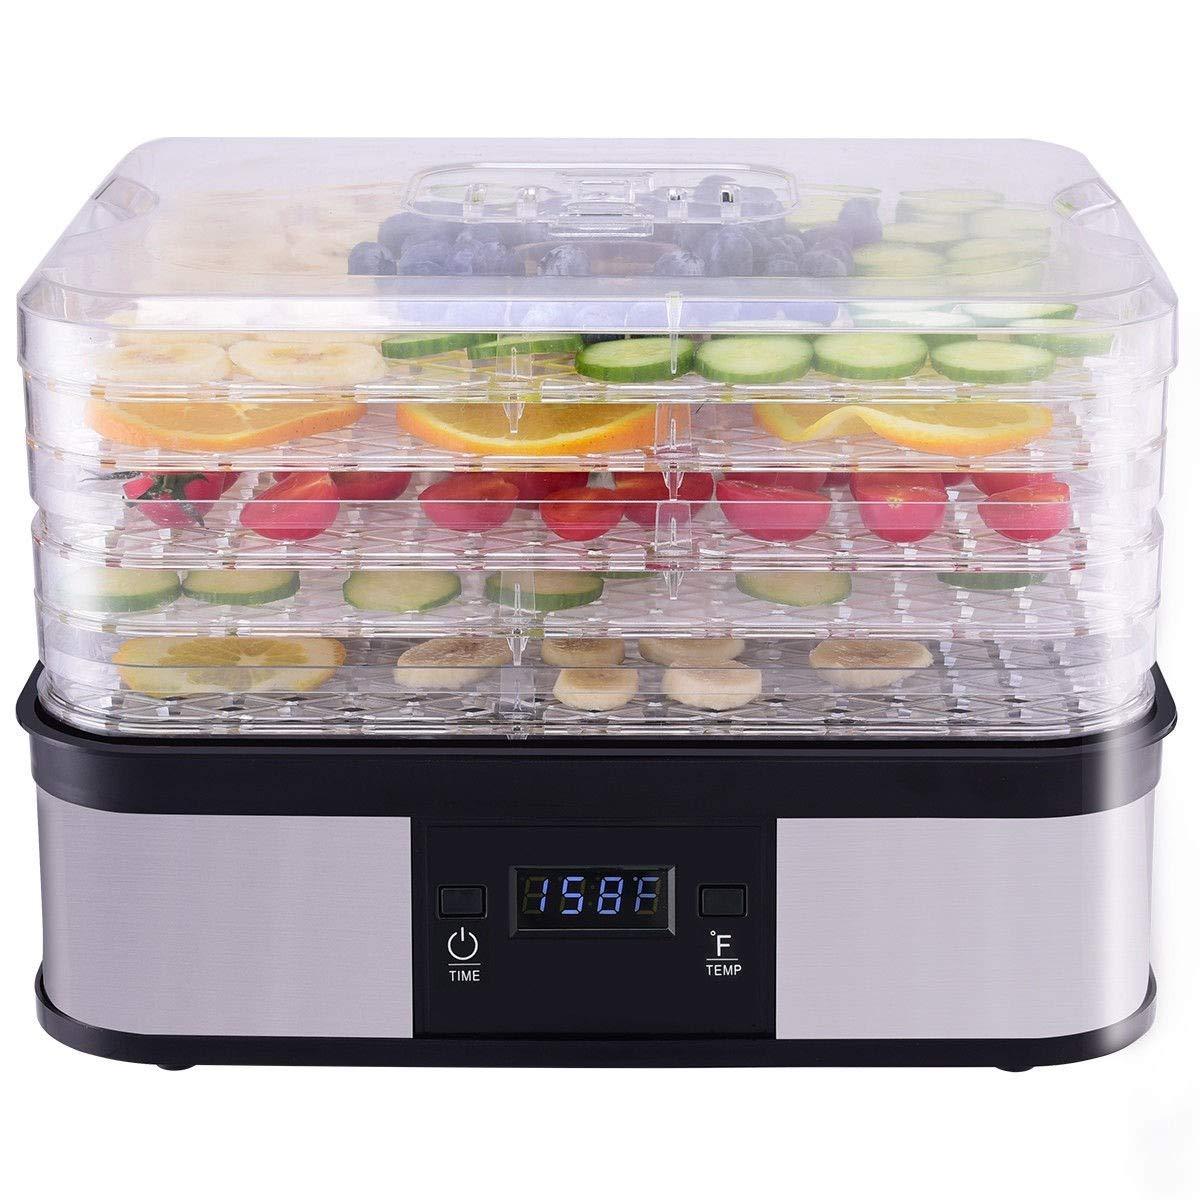 CHOOSEandBUY Timer Temperature Control 5 Tray Fruit Vegetable Dryer New Perfect Beautiful Classic Elegant Useful